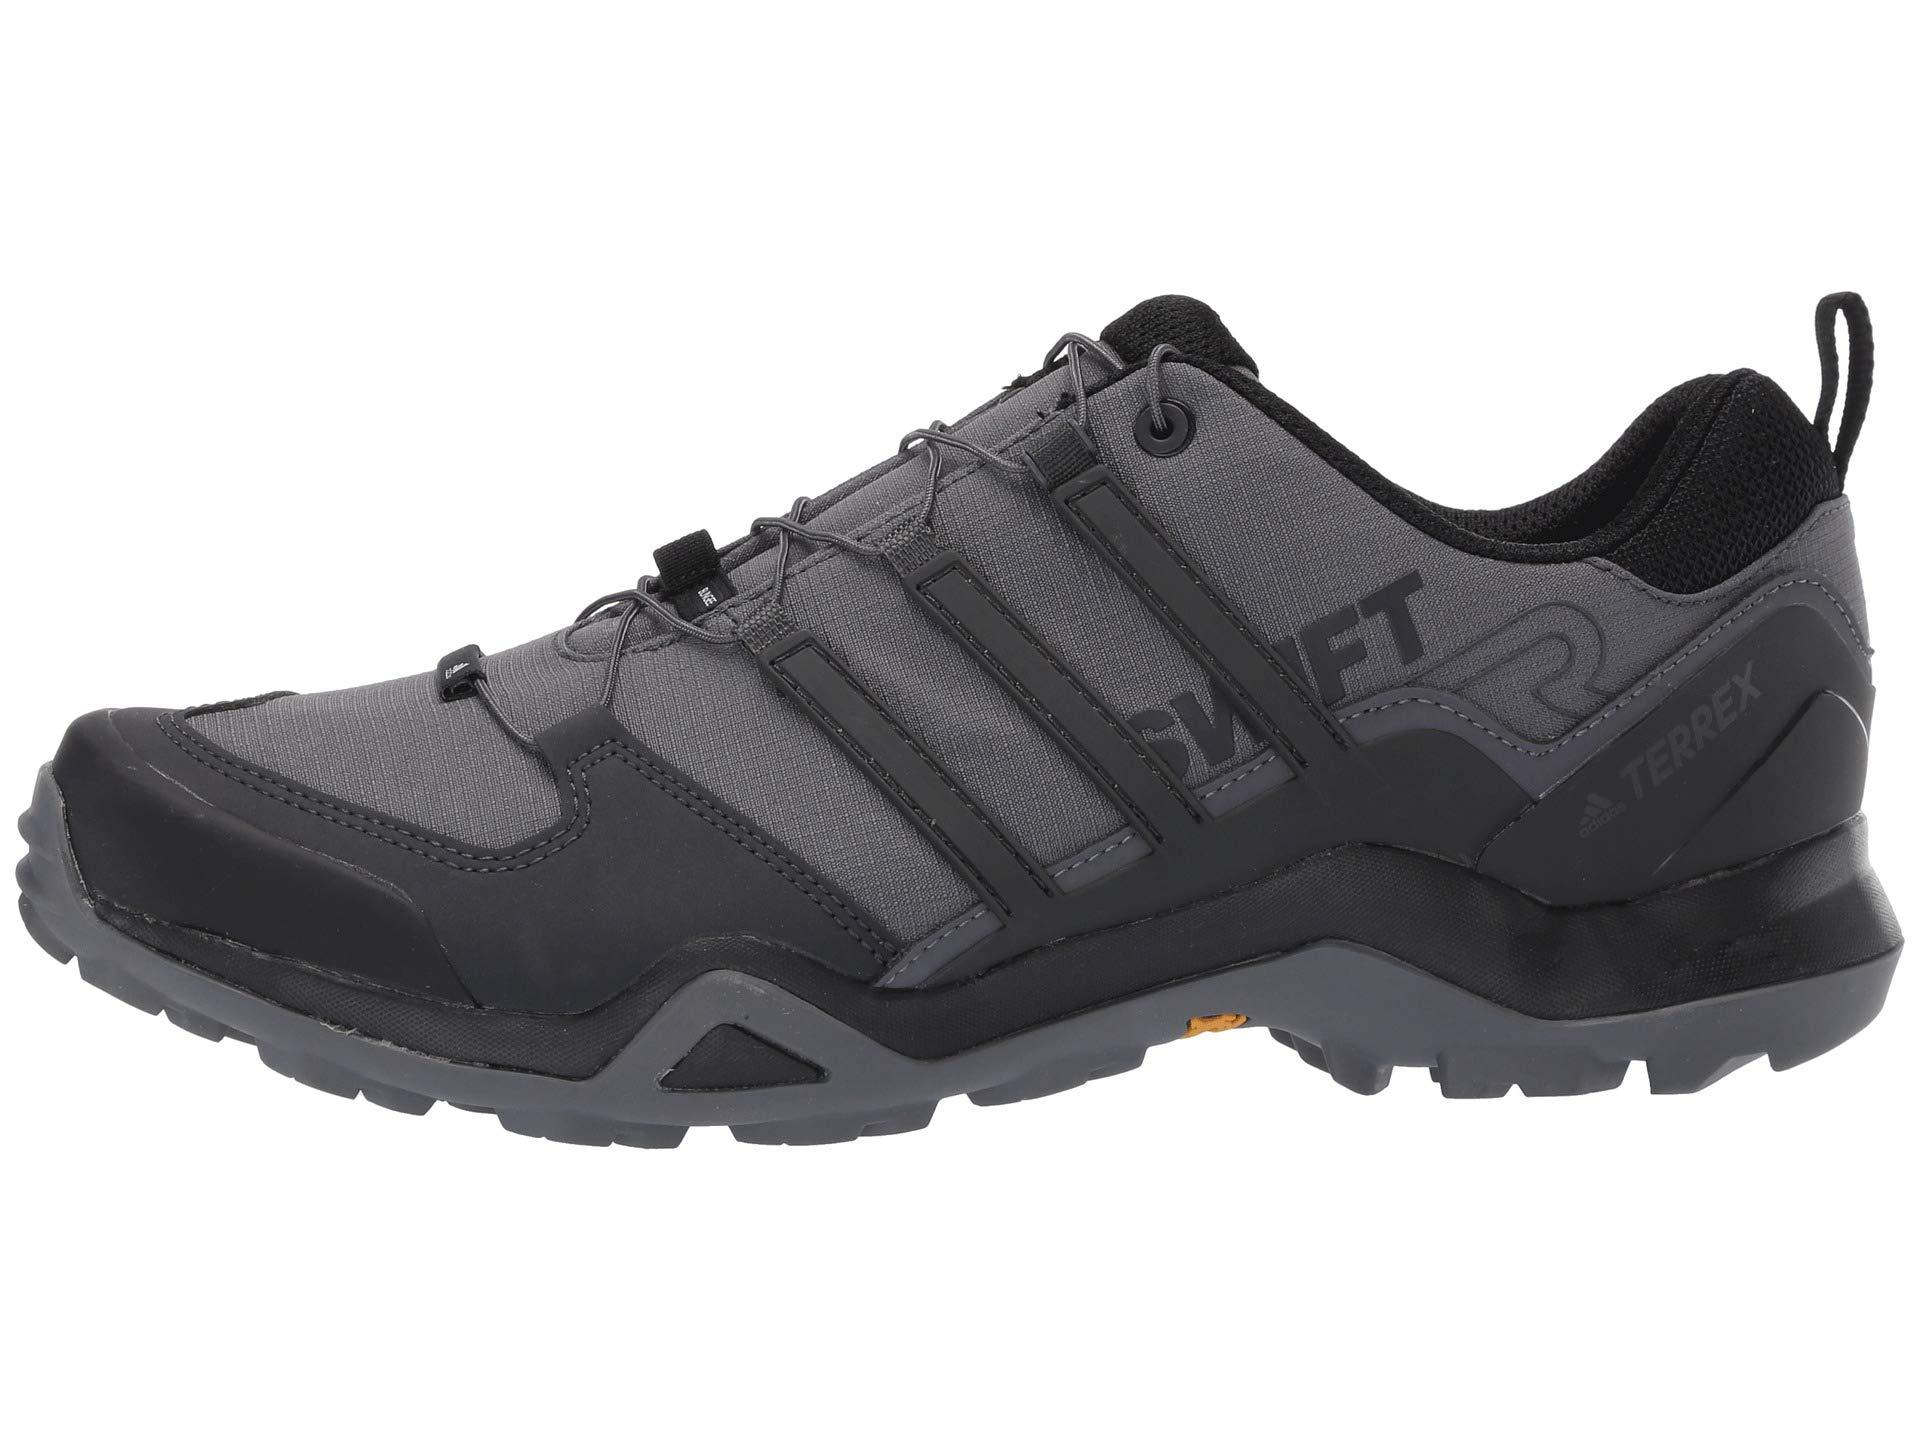 wholesale dealer ab17b a369d Lyst - adidas Originals Terrex Swift R2 (grey Six carbon grey Five) Men s  Climbing Shoes in Black for Men